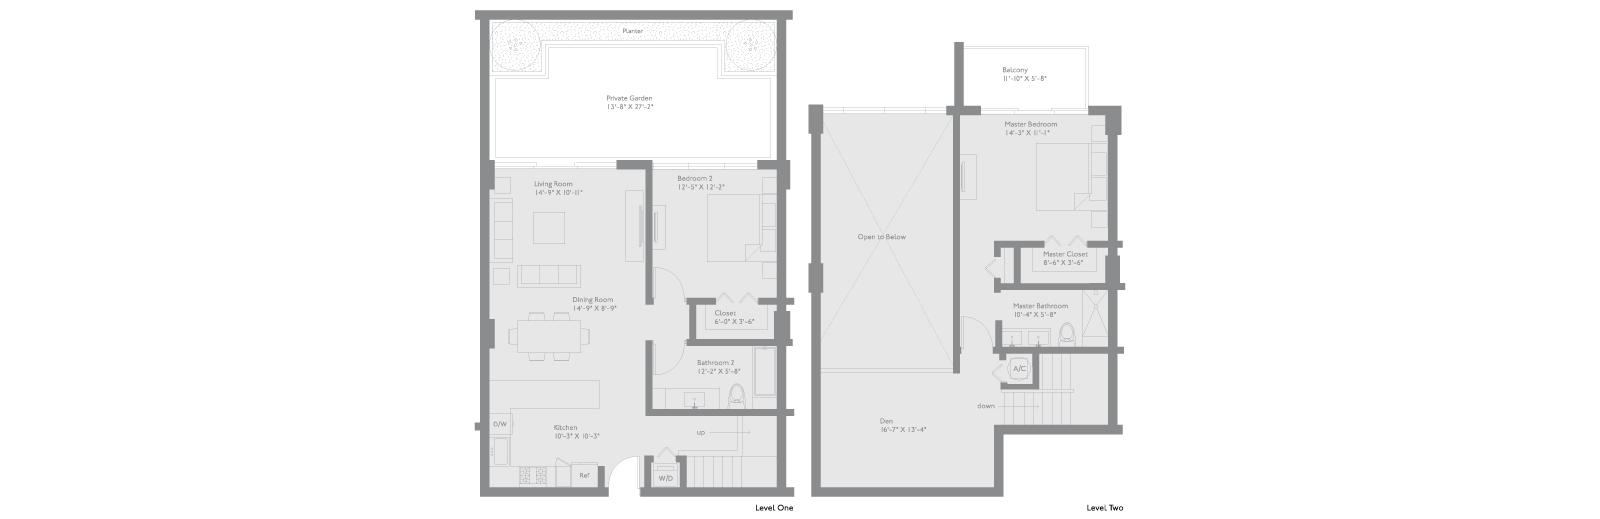 Arbor Floor Plan B 12 15 17